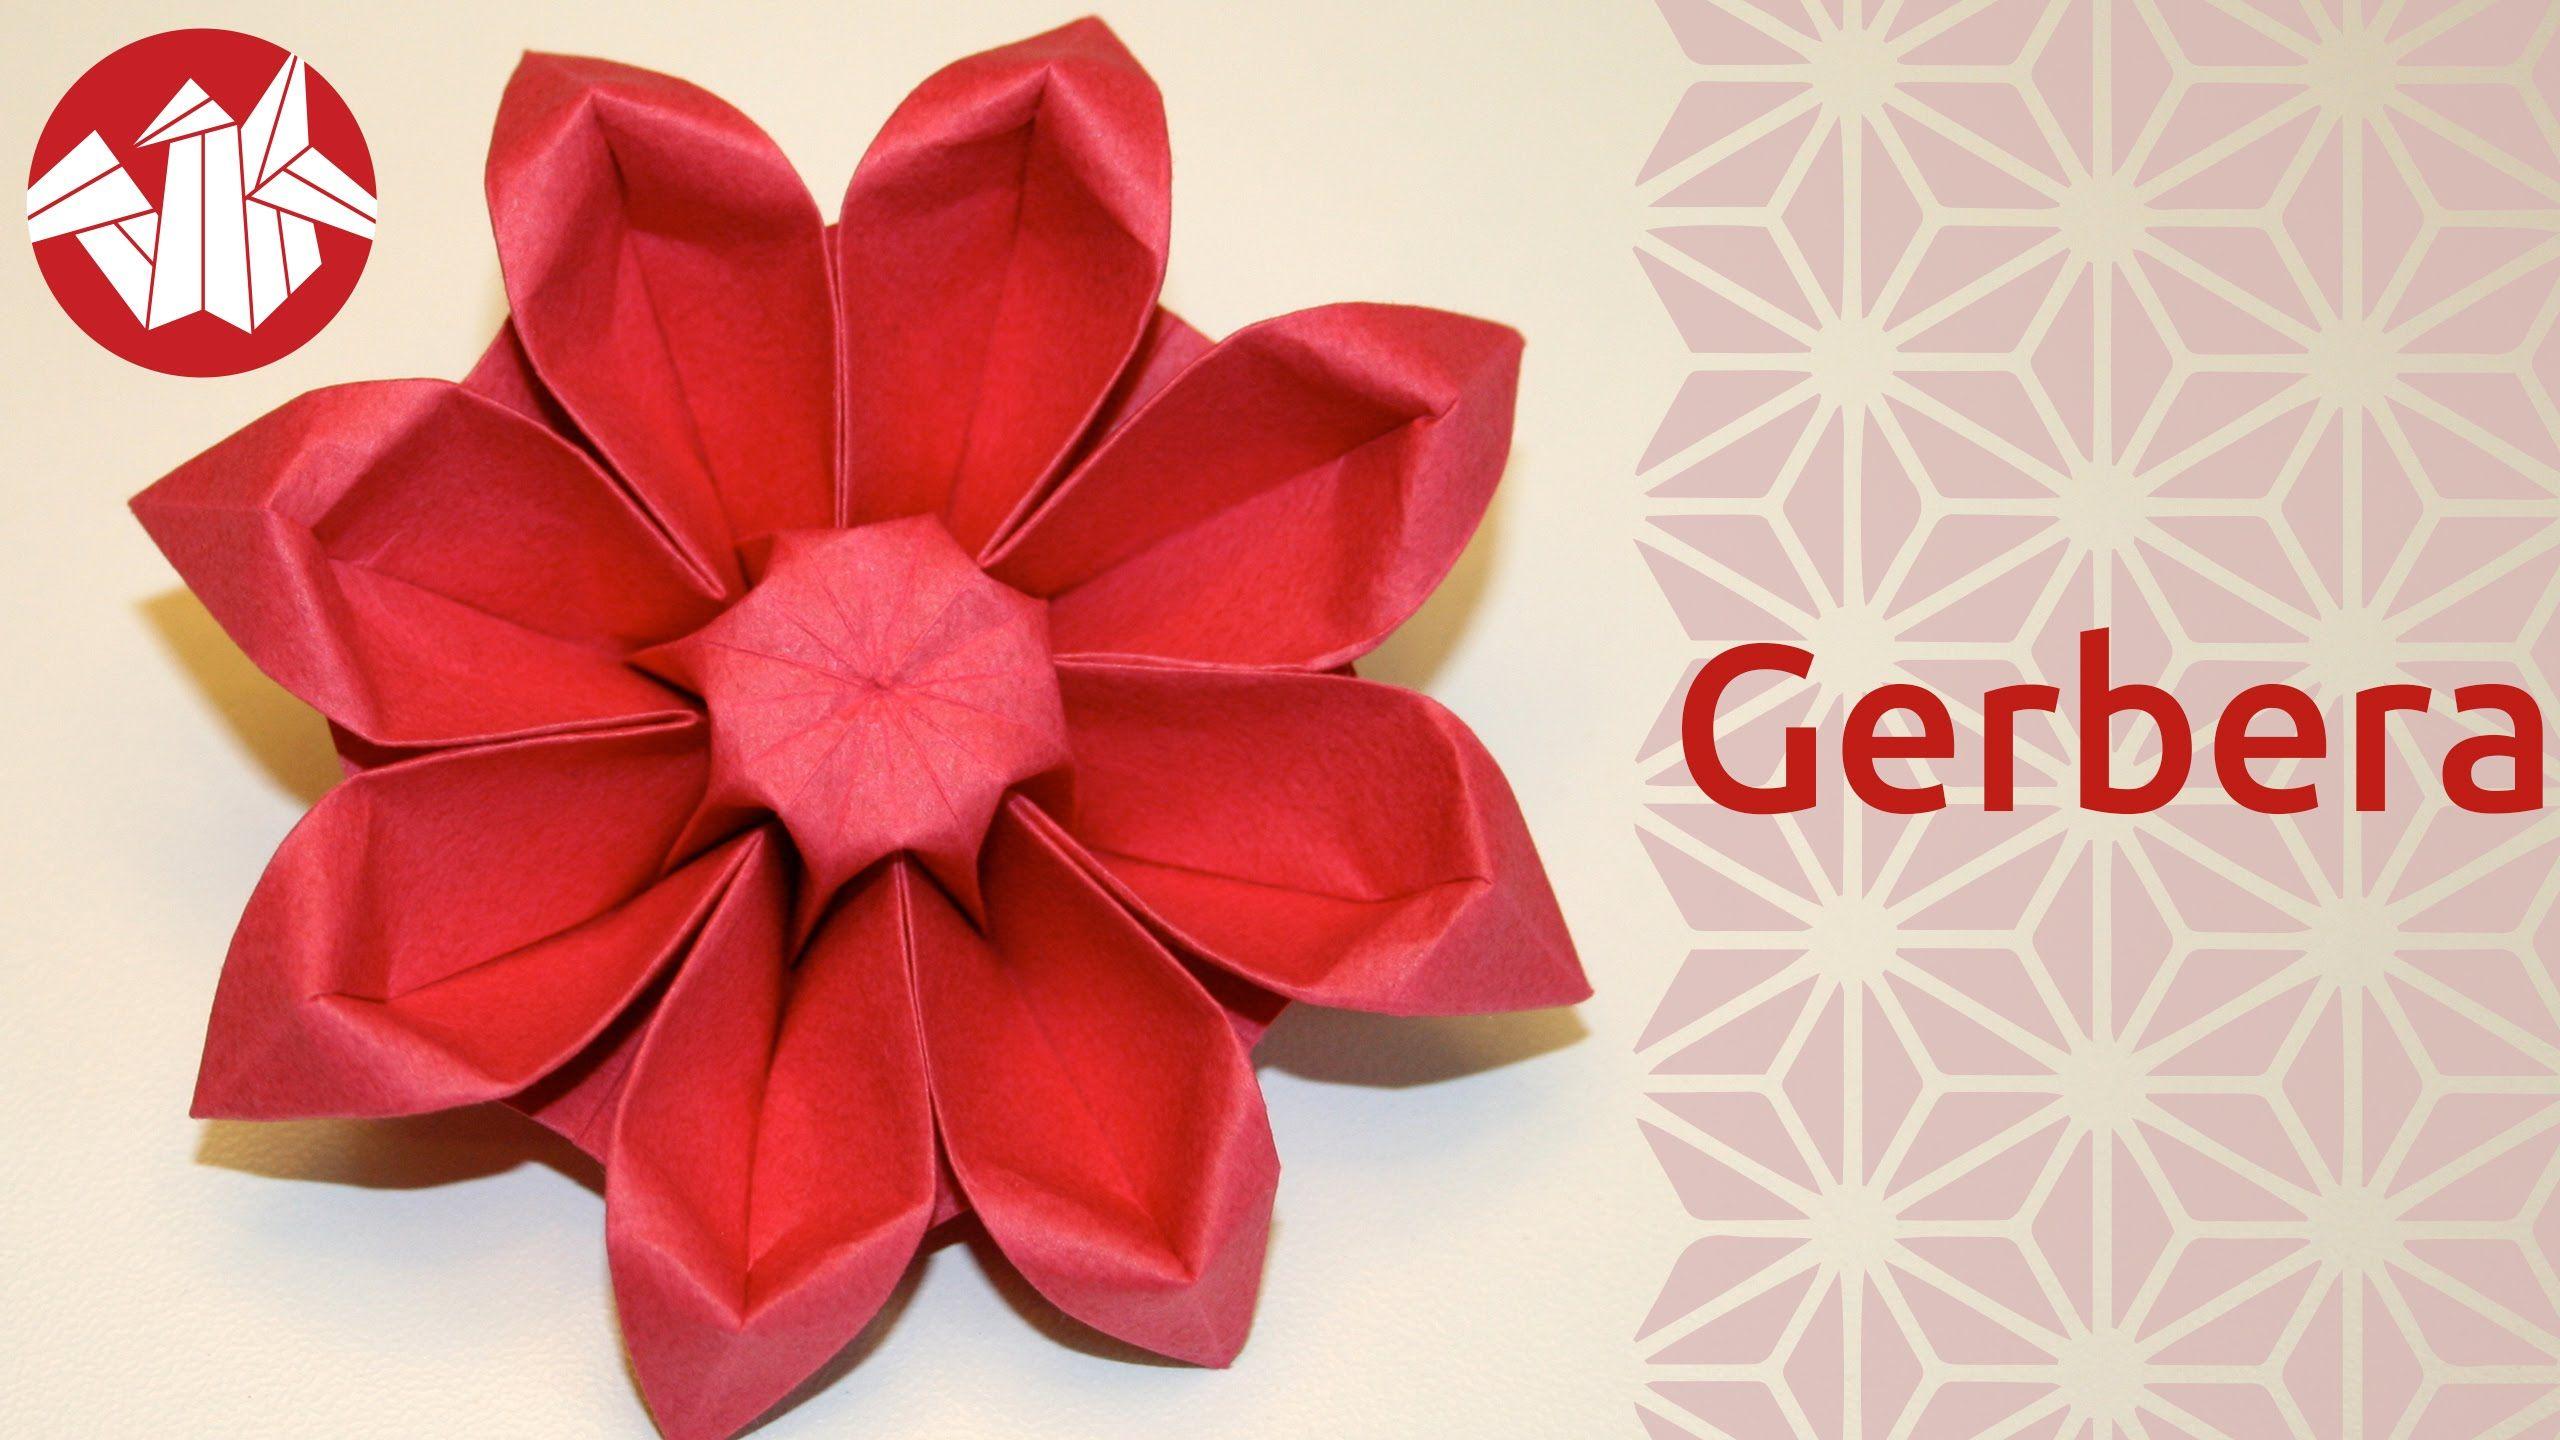 Origami fleur gerbera flower origami gerbera senbazuru origami fleur gerbera flower origami gerbera senbazuru mightylinksfo Image collections